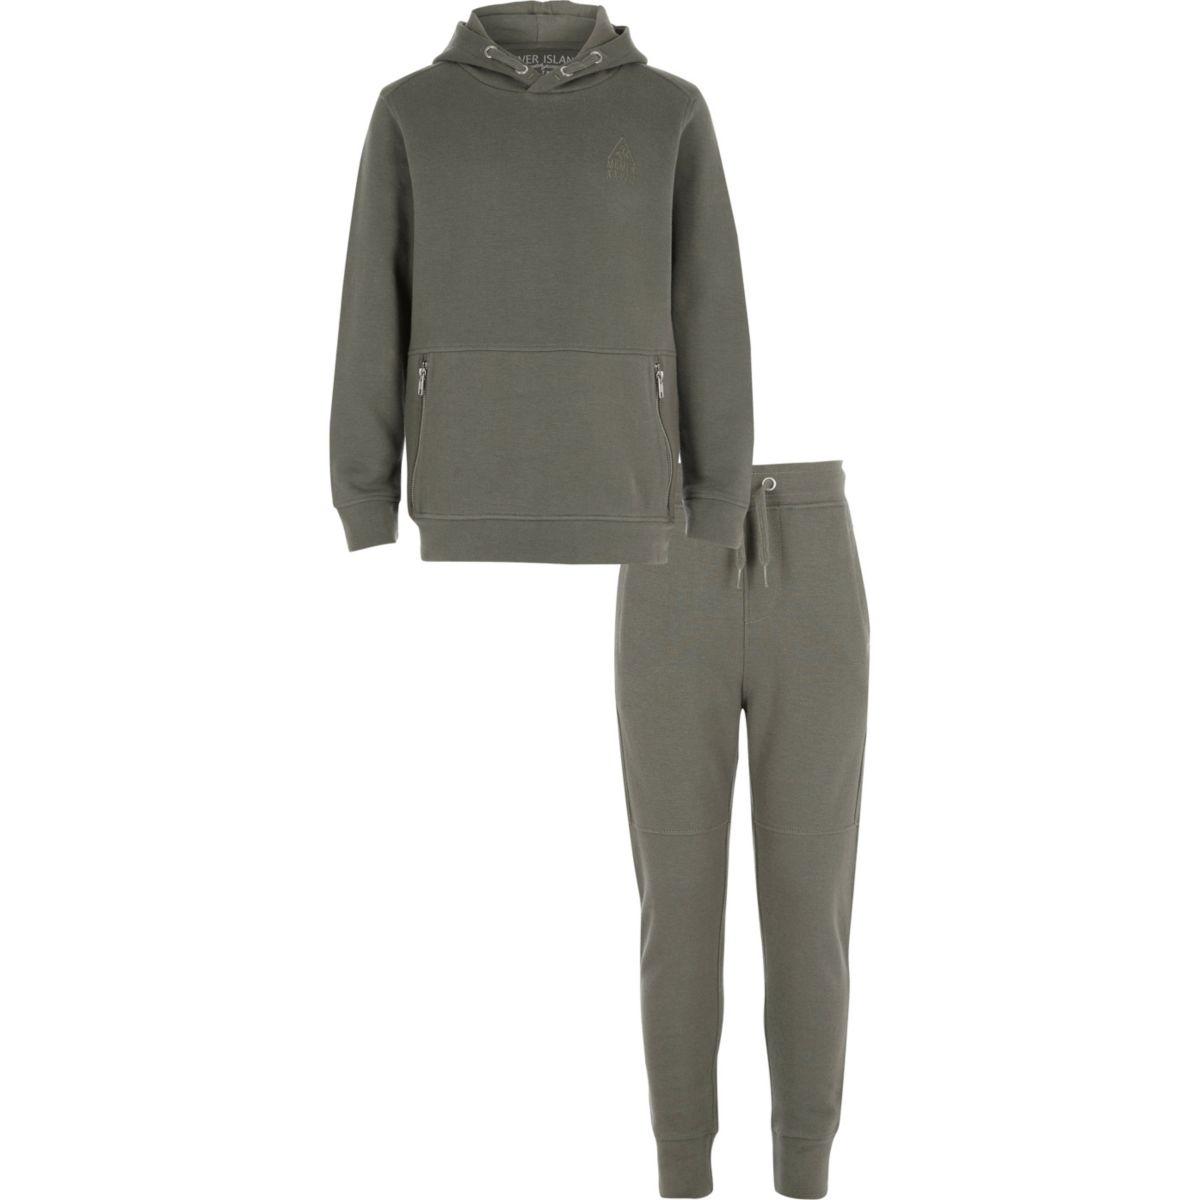 Boys khaki pique hoodie outfit